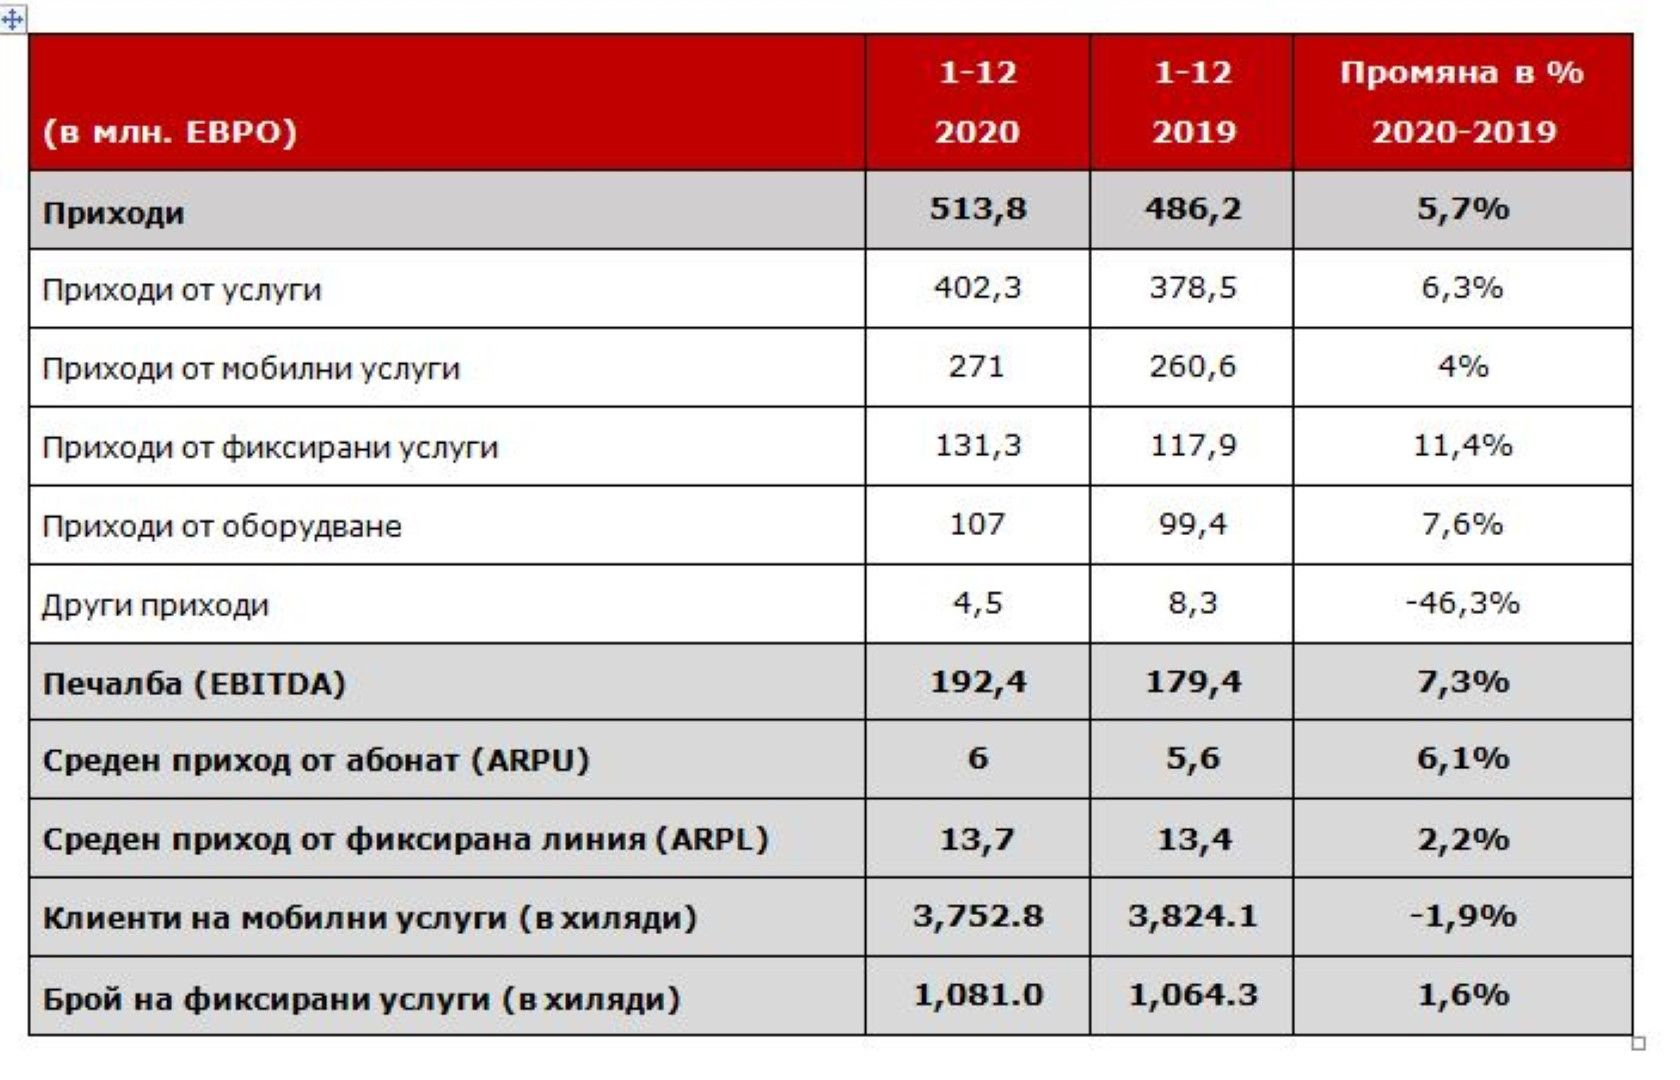 Финансови резултати на А1 за 2020 г.